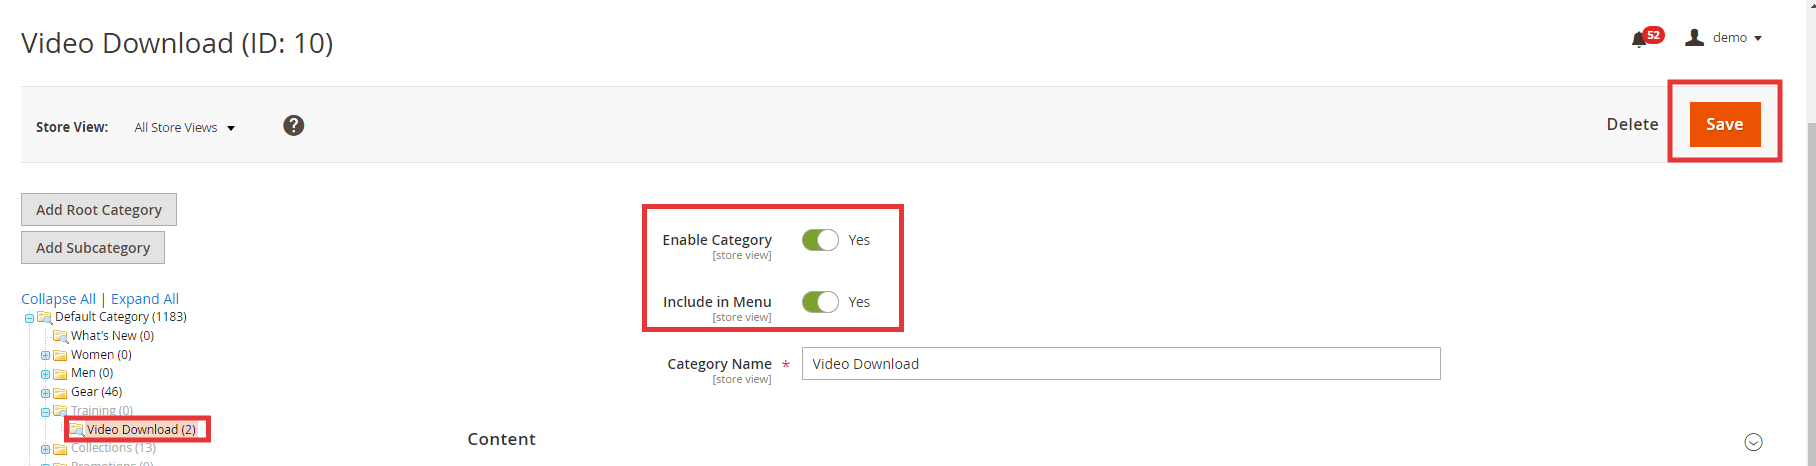 How to Hide Categories in Magento 2 4